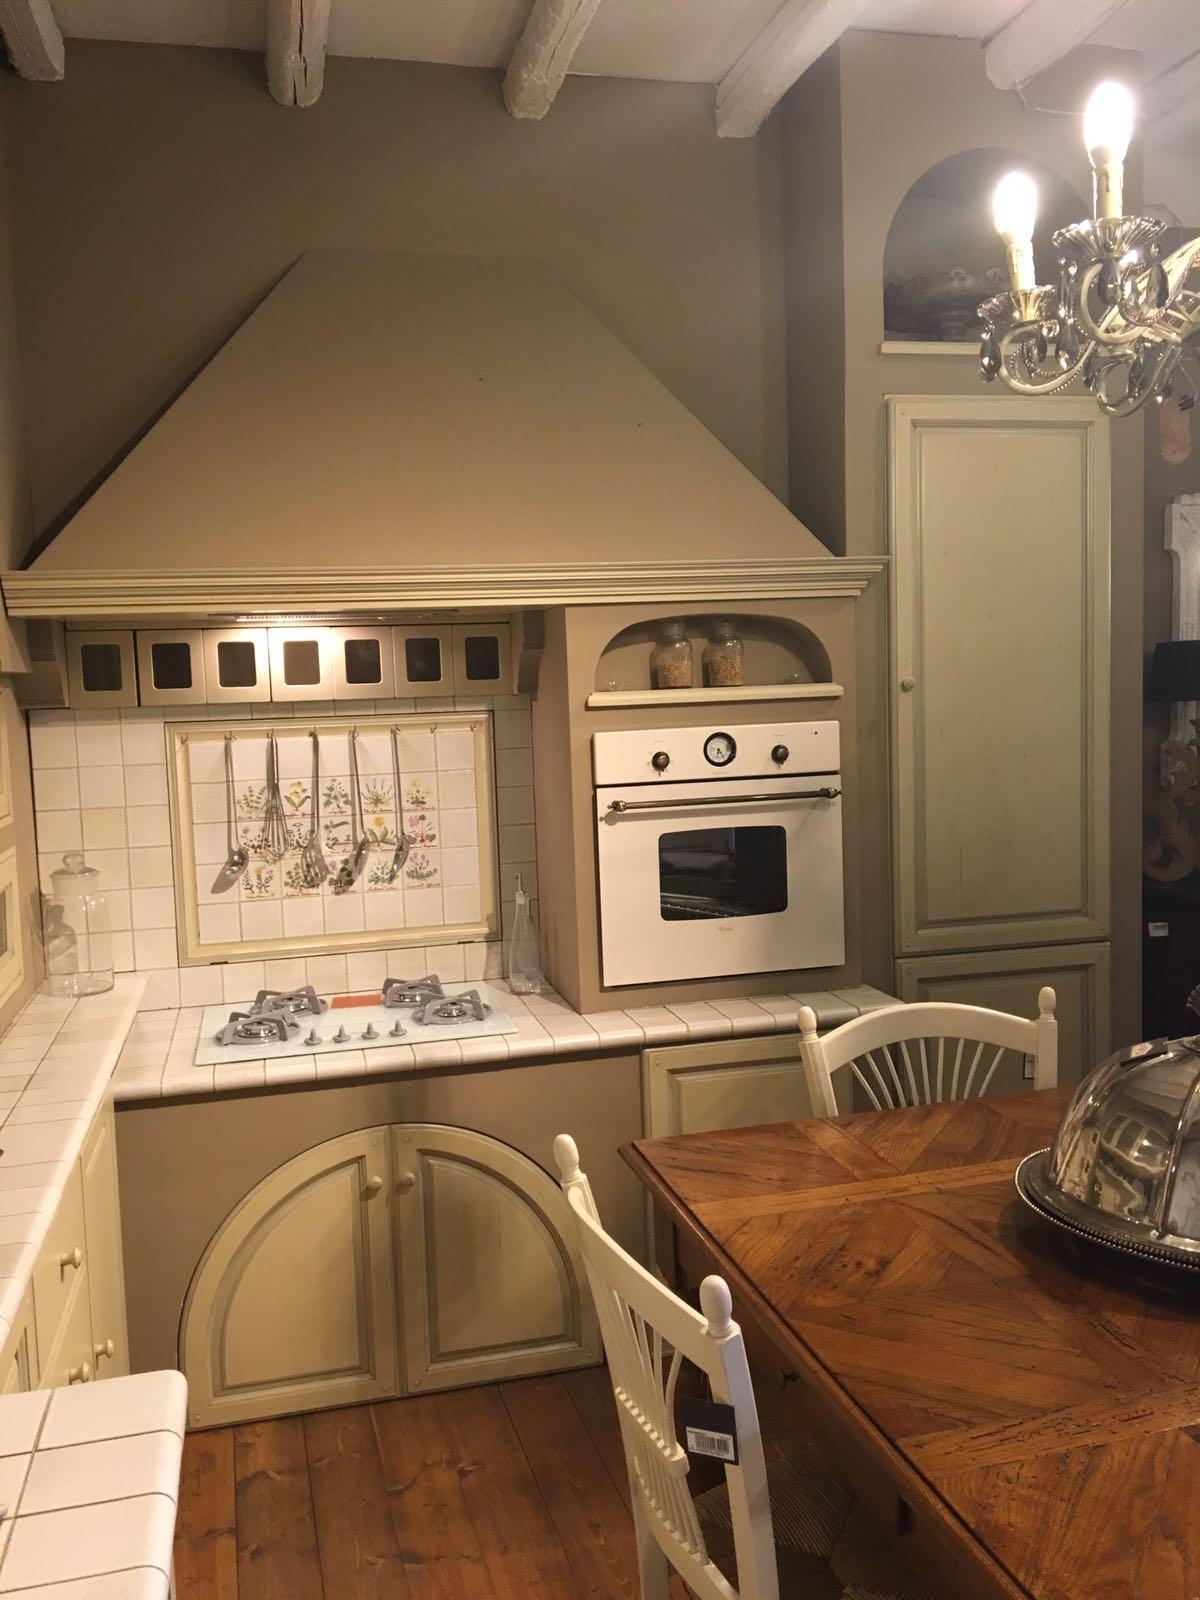 Marchi cucine cucina granduca scontato del 55 cucine - Marchi cucine outlet ...